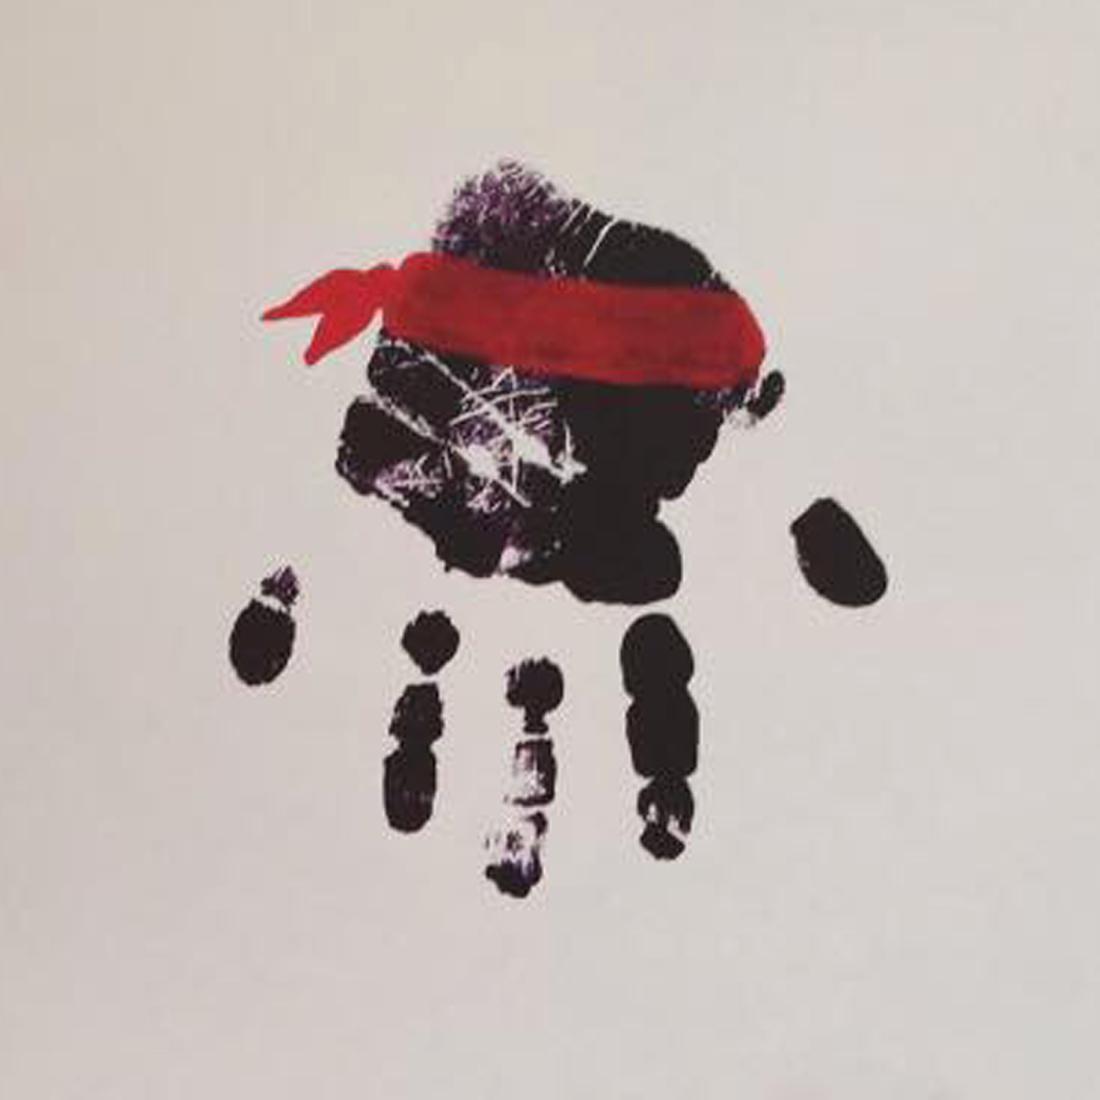 ninja handprint painting